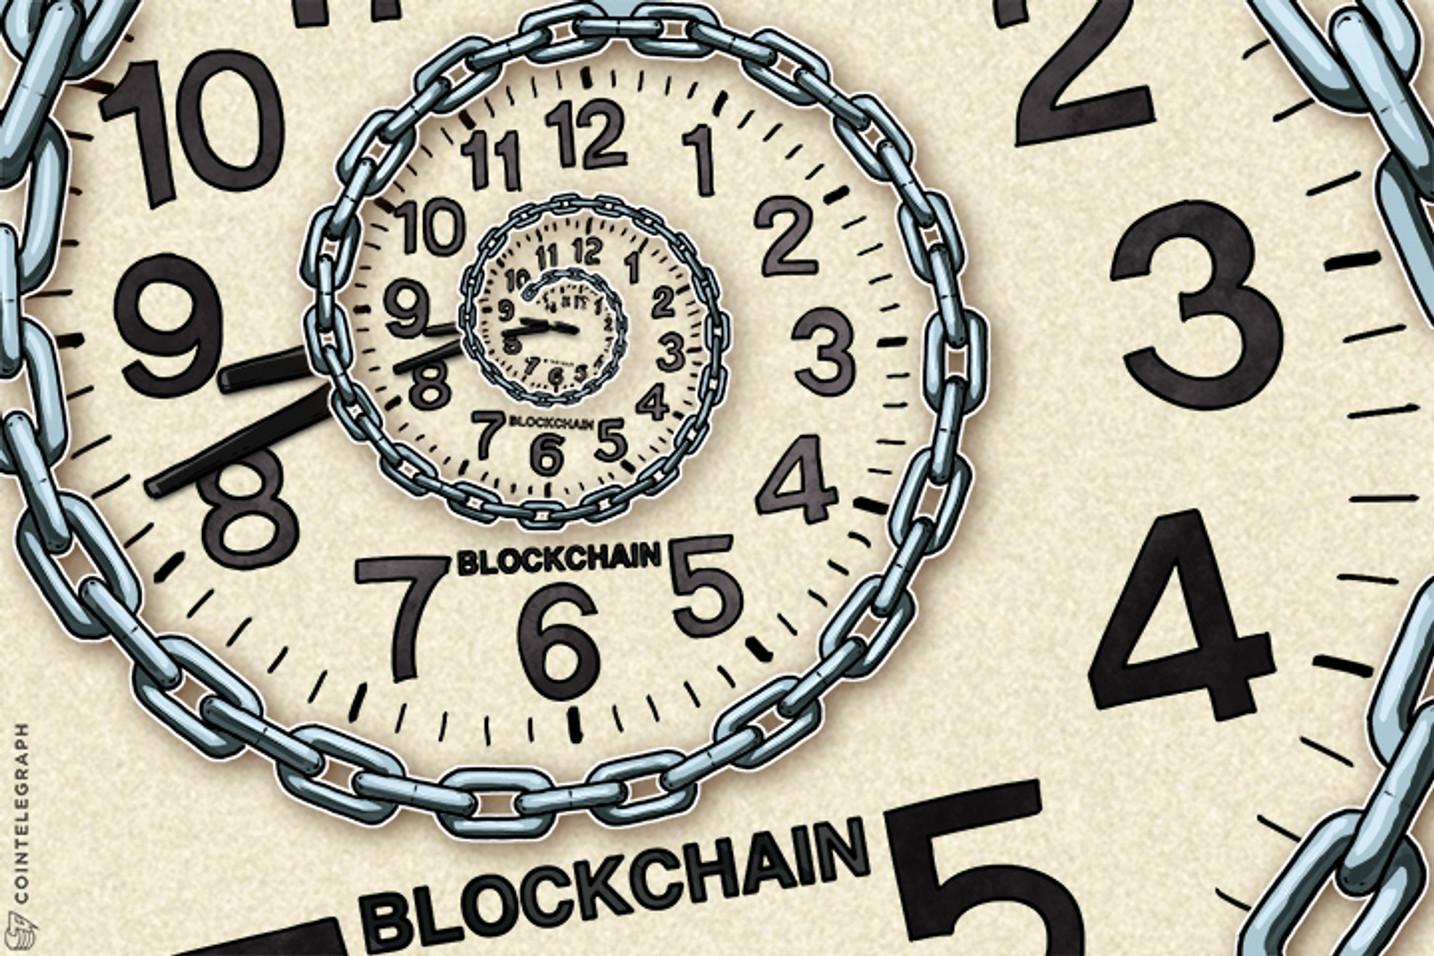 World Economic Forum:  Blockchain Is Inevitable Phenomenon, Bitcoin Will Follow?